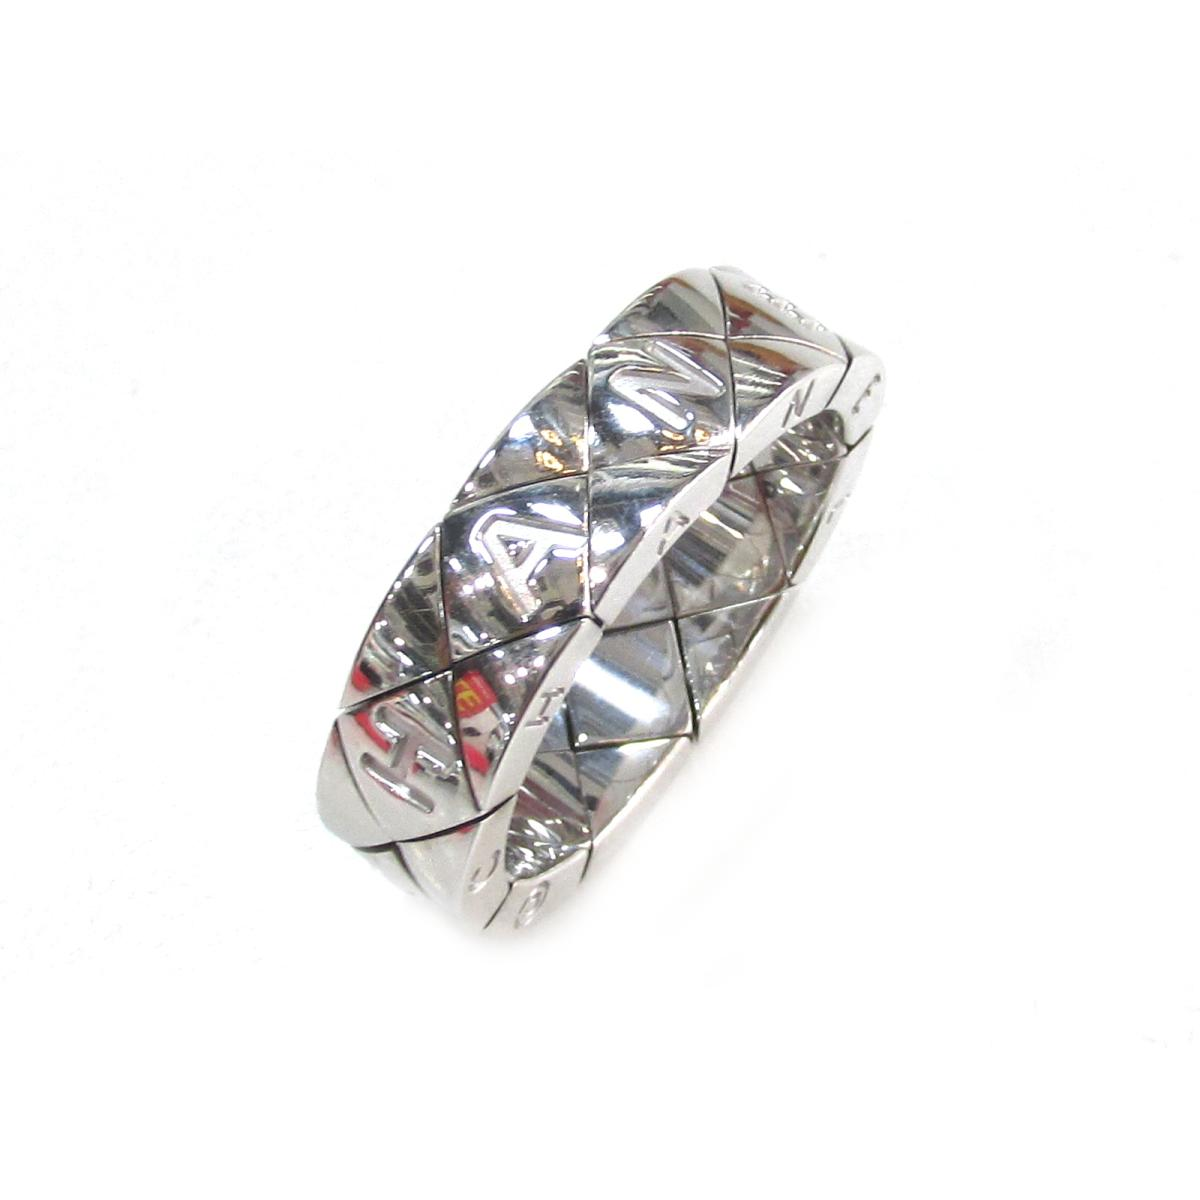 c0bf60bc326b ... シャネル マトラッセリング 指輪 メンズ レディース K18WG (750) ホワイトゴールド | CHANEL リング K18 18K  18金 マトラッセリング 美品 ブランドオフ BRANDOFF